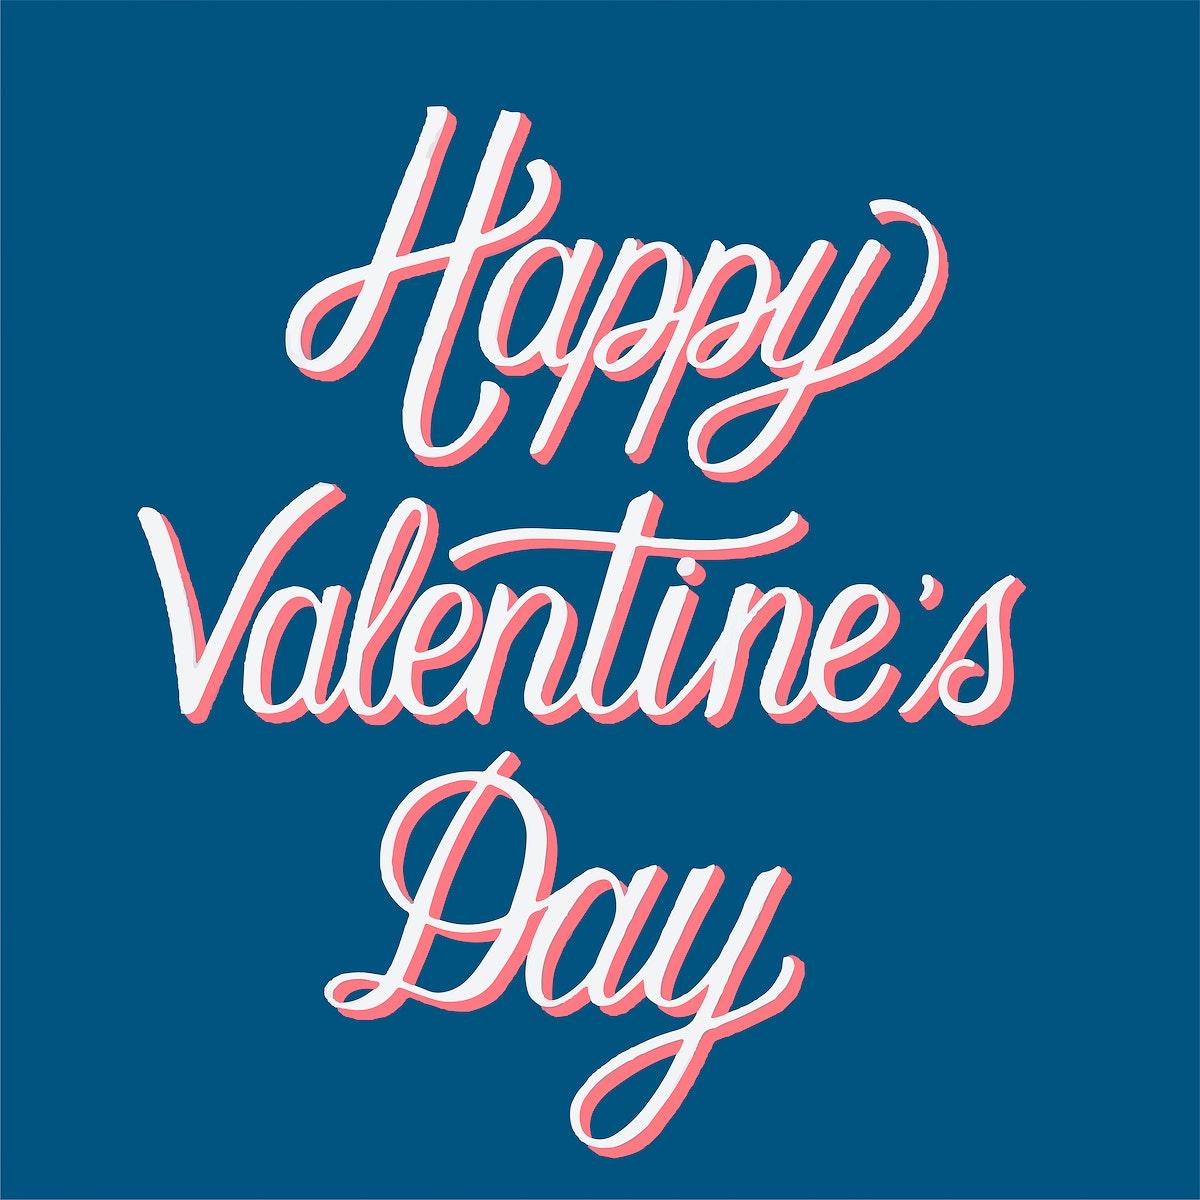 Handwritten style of Happy Valentine's Day typography